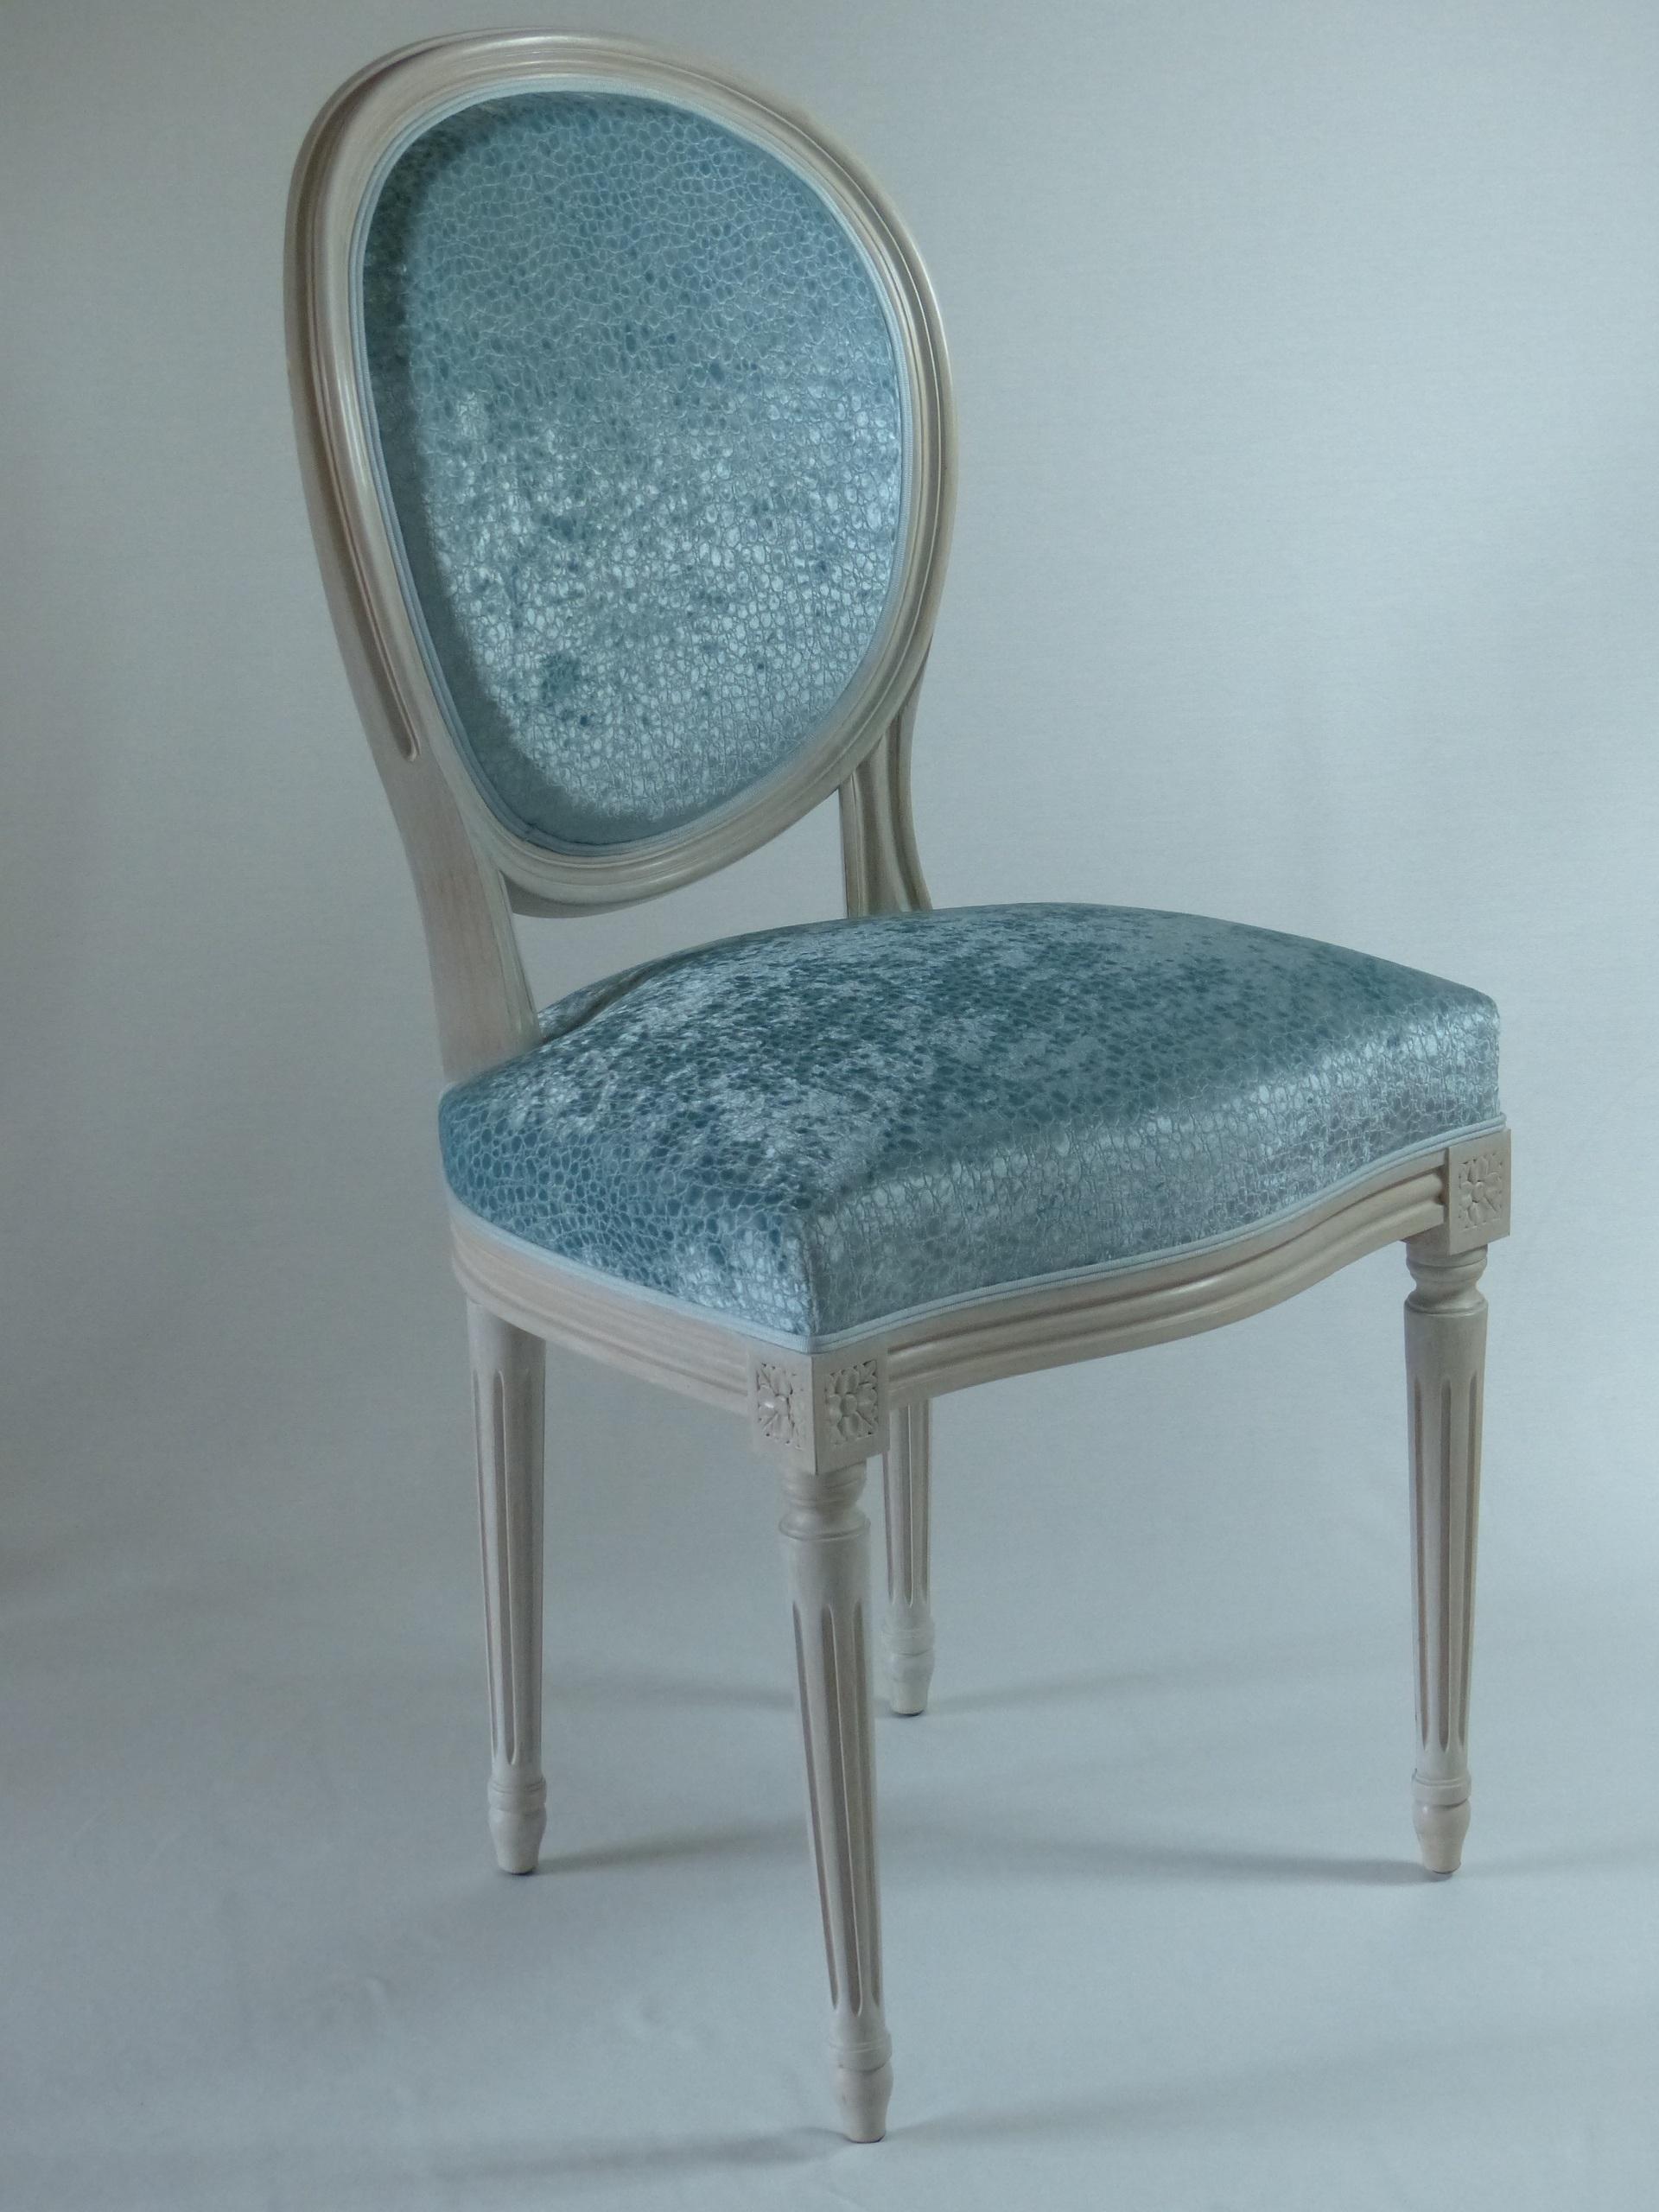 Chair Furniture Fabric Armrest Medallion Product Design Upholsterer